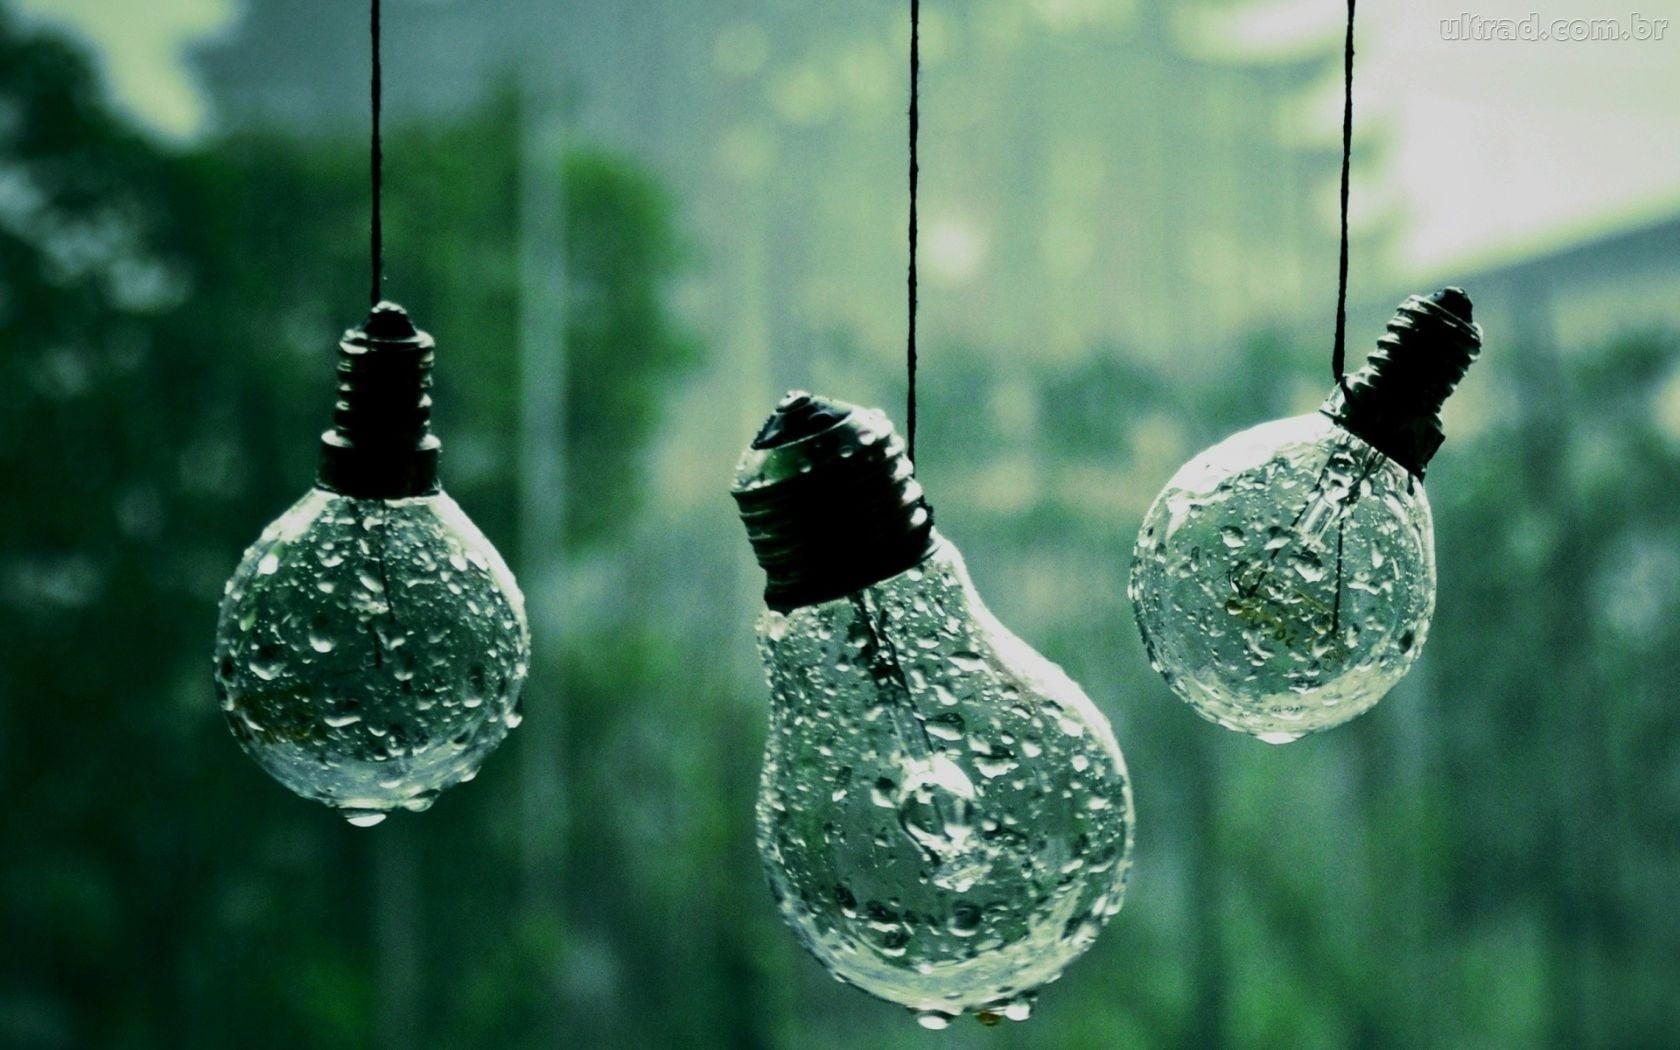 Three incandescent bulbs lightbulb HD wallpaper Wallpaper Flare 1680x1050